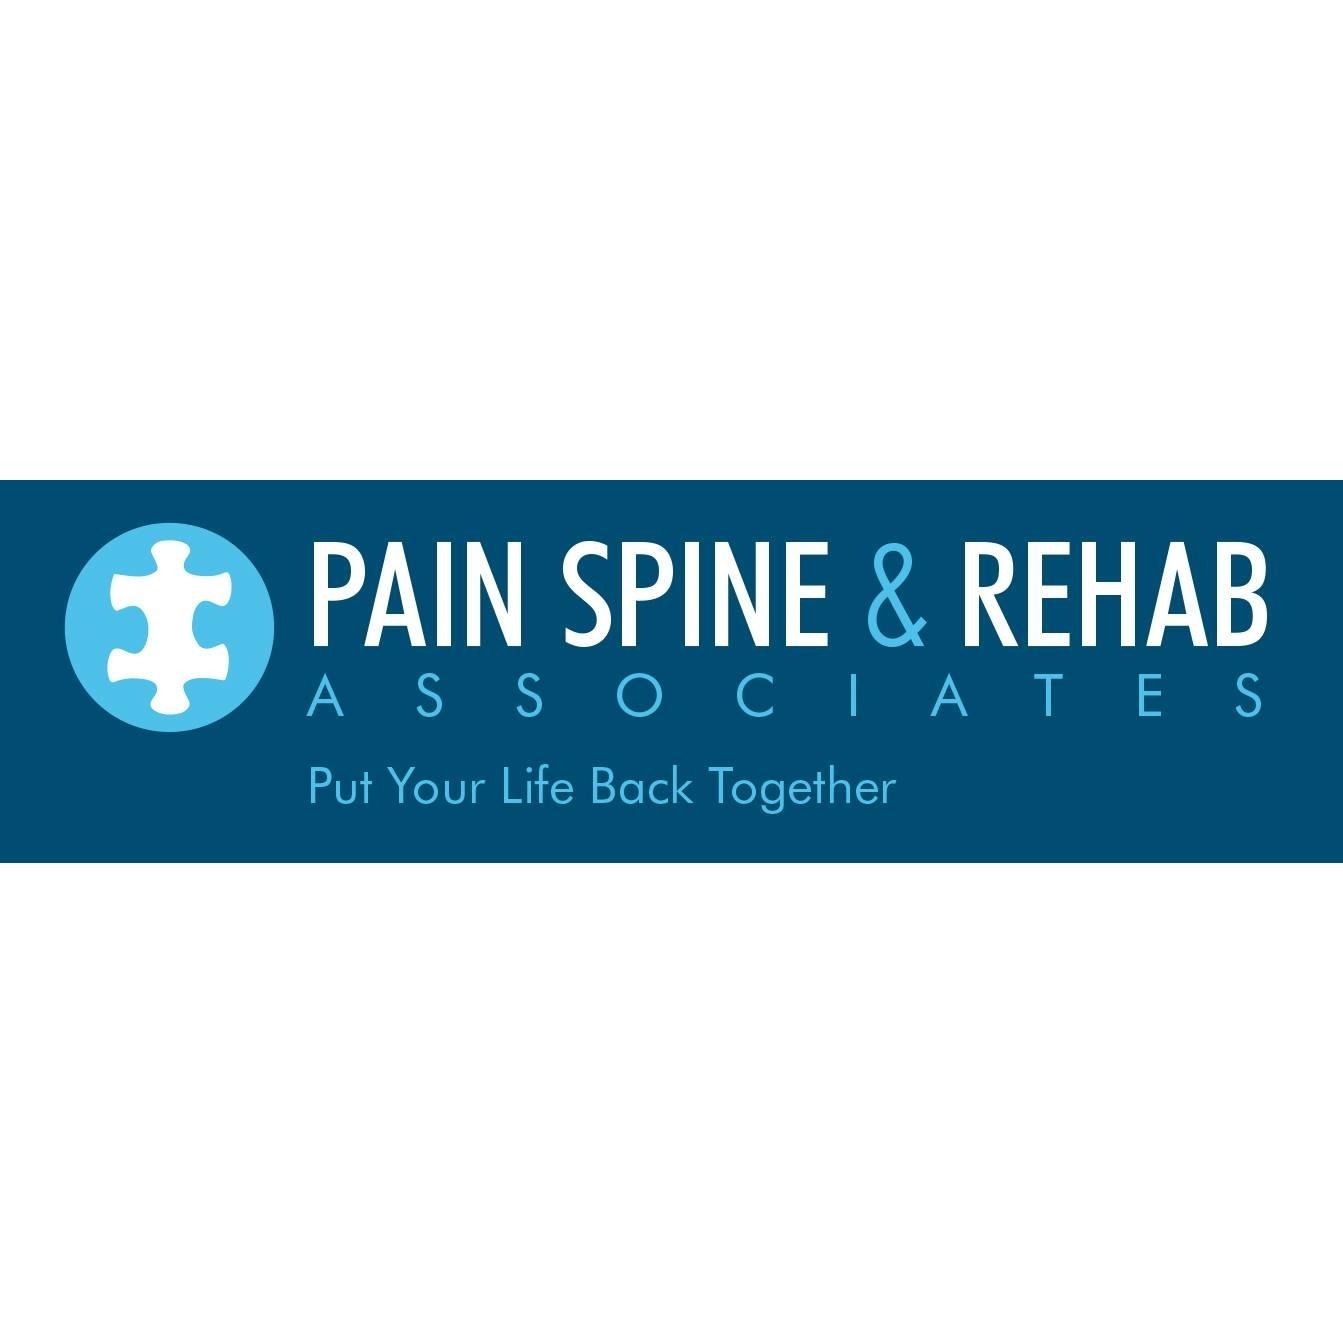 Pain, Spine & Rehab Associates